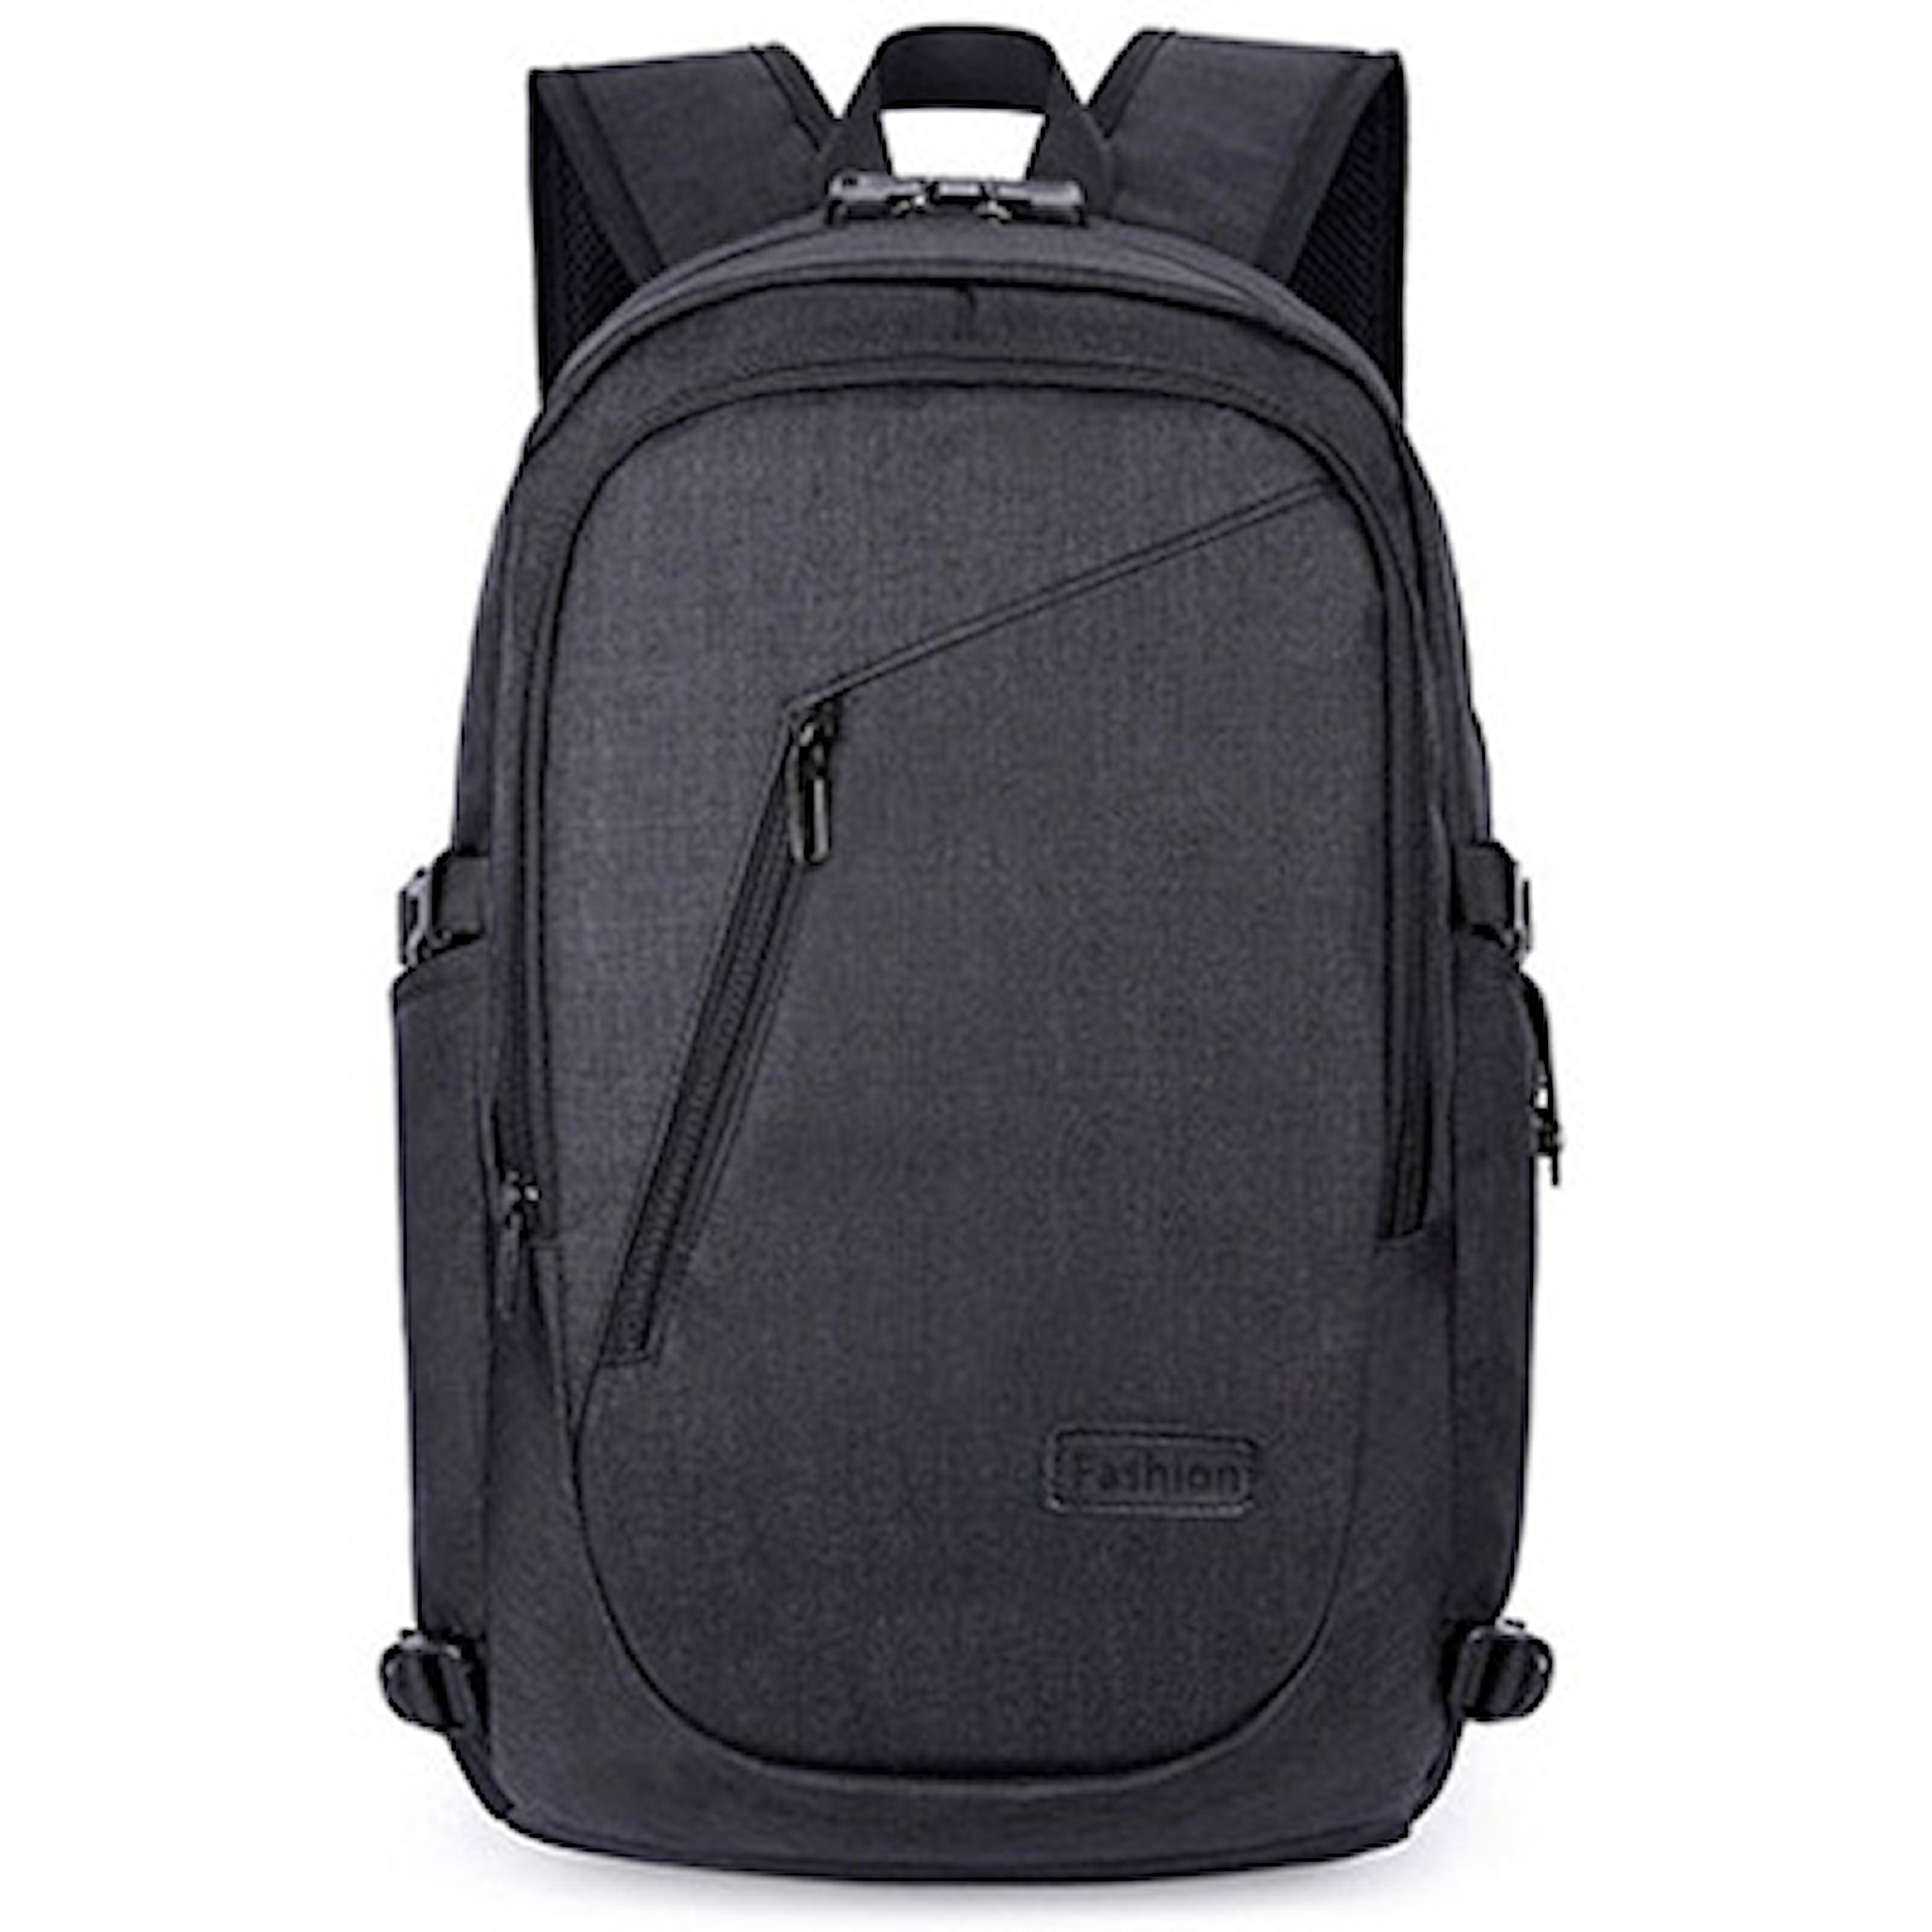 Musta, Backpack with gadgets, Fiksu selkäreppu, ,